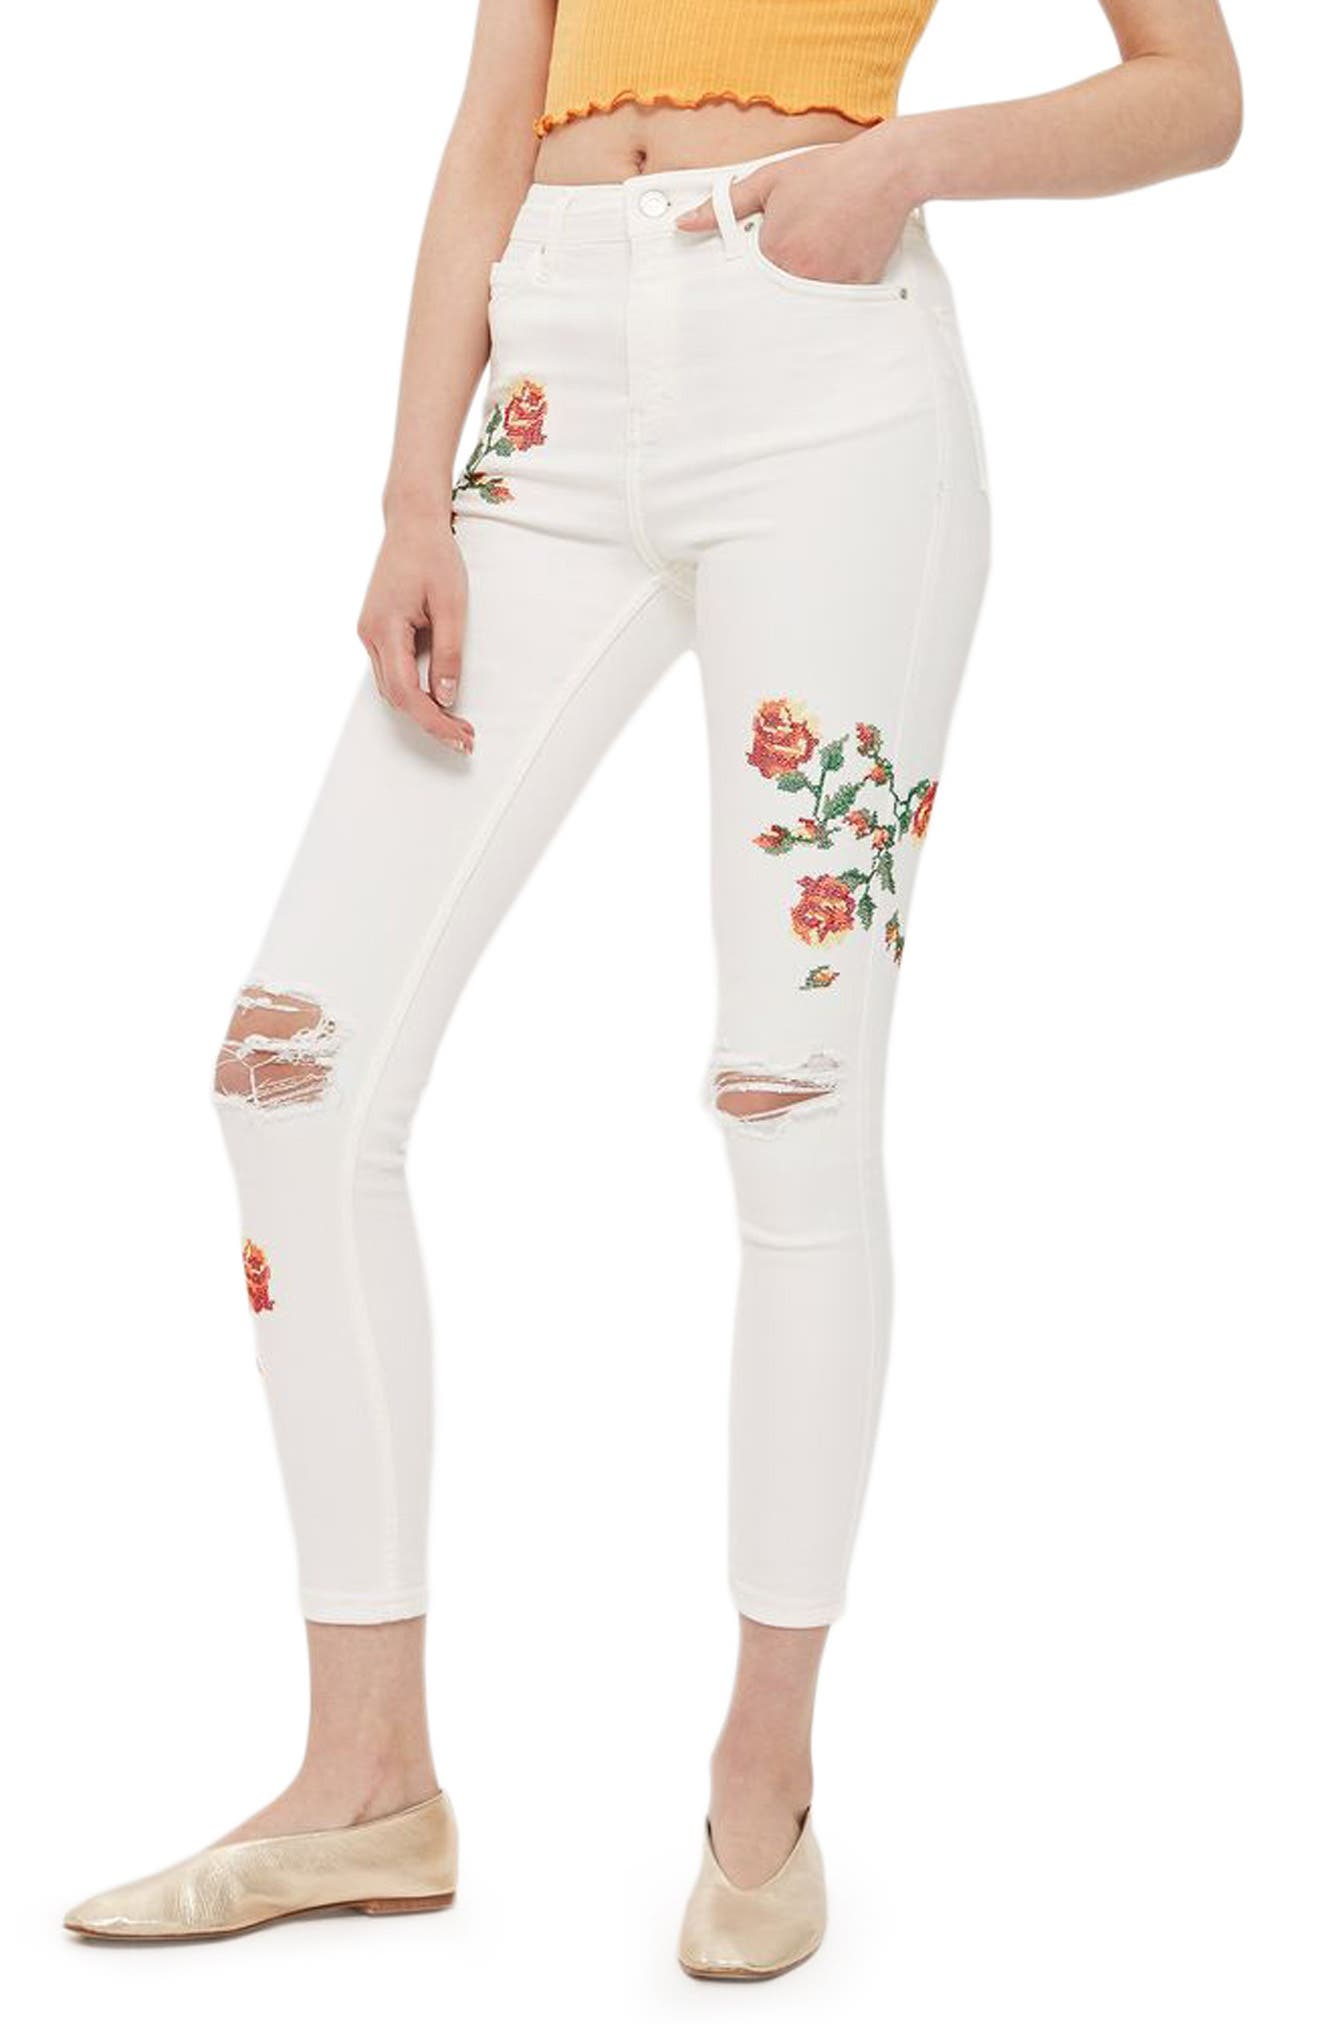 Alternate Image 1 Selected - Topshop Jamie Embroidered Skinny Jeans (Regular & Petite)